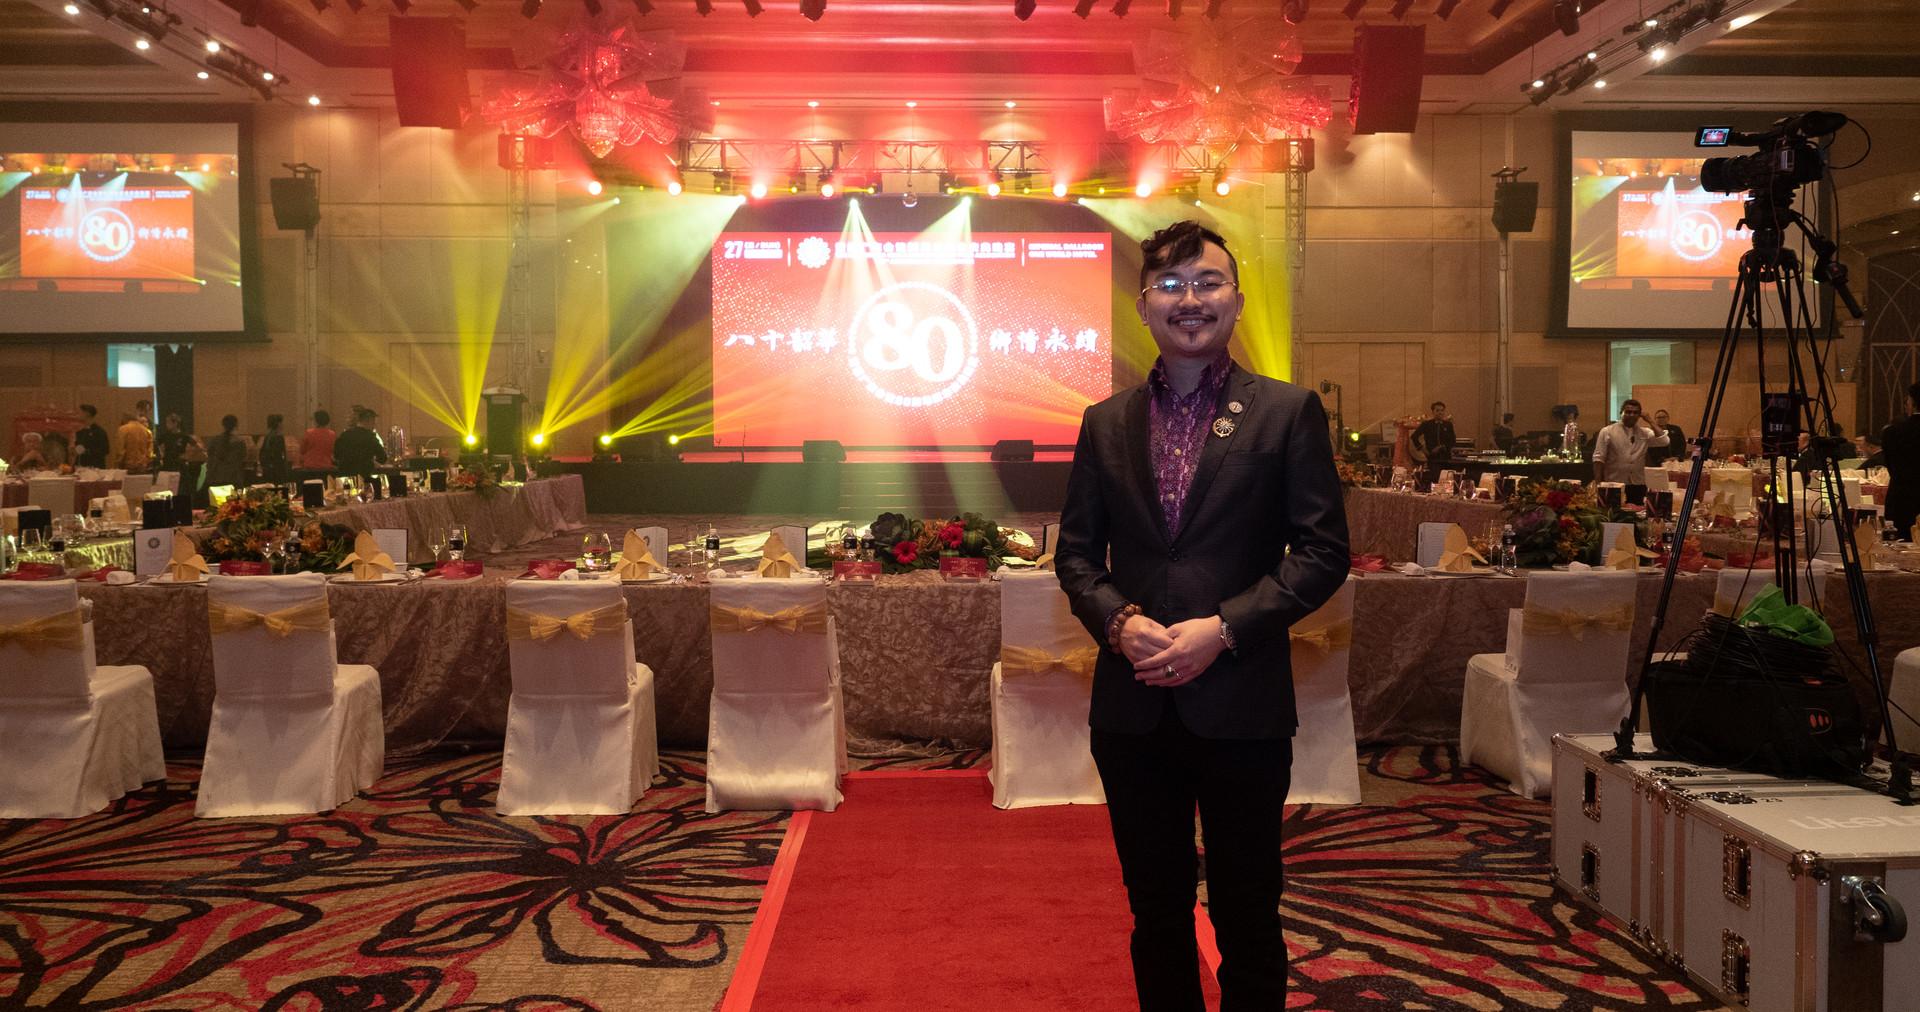 The Selangor and Kuala Lumpur Kwang Tung Association 80th Anniversary Celebration